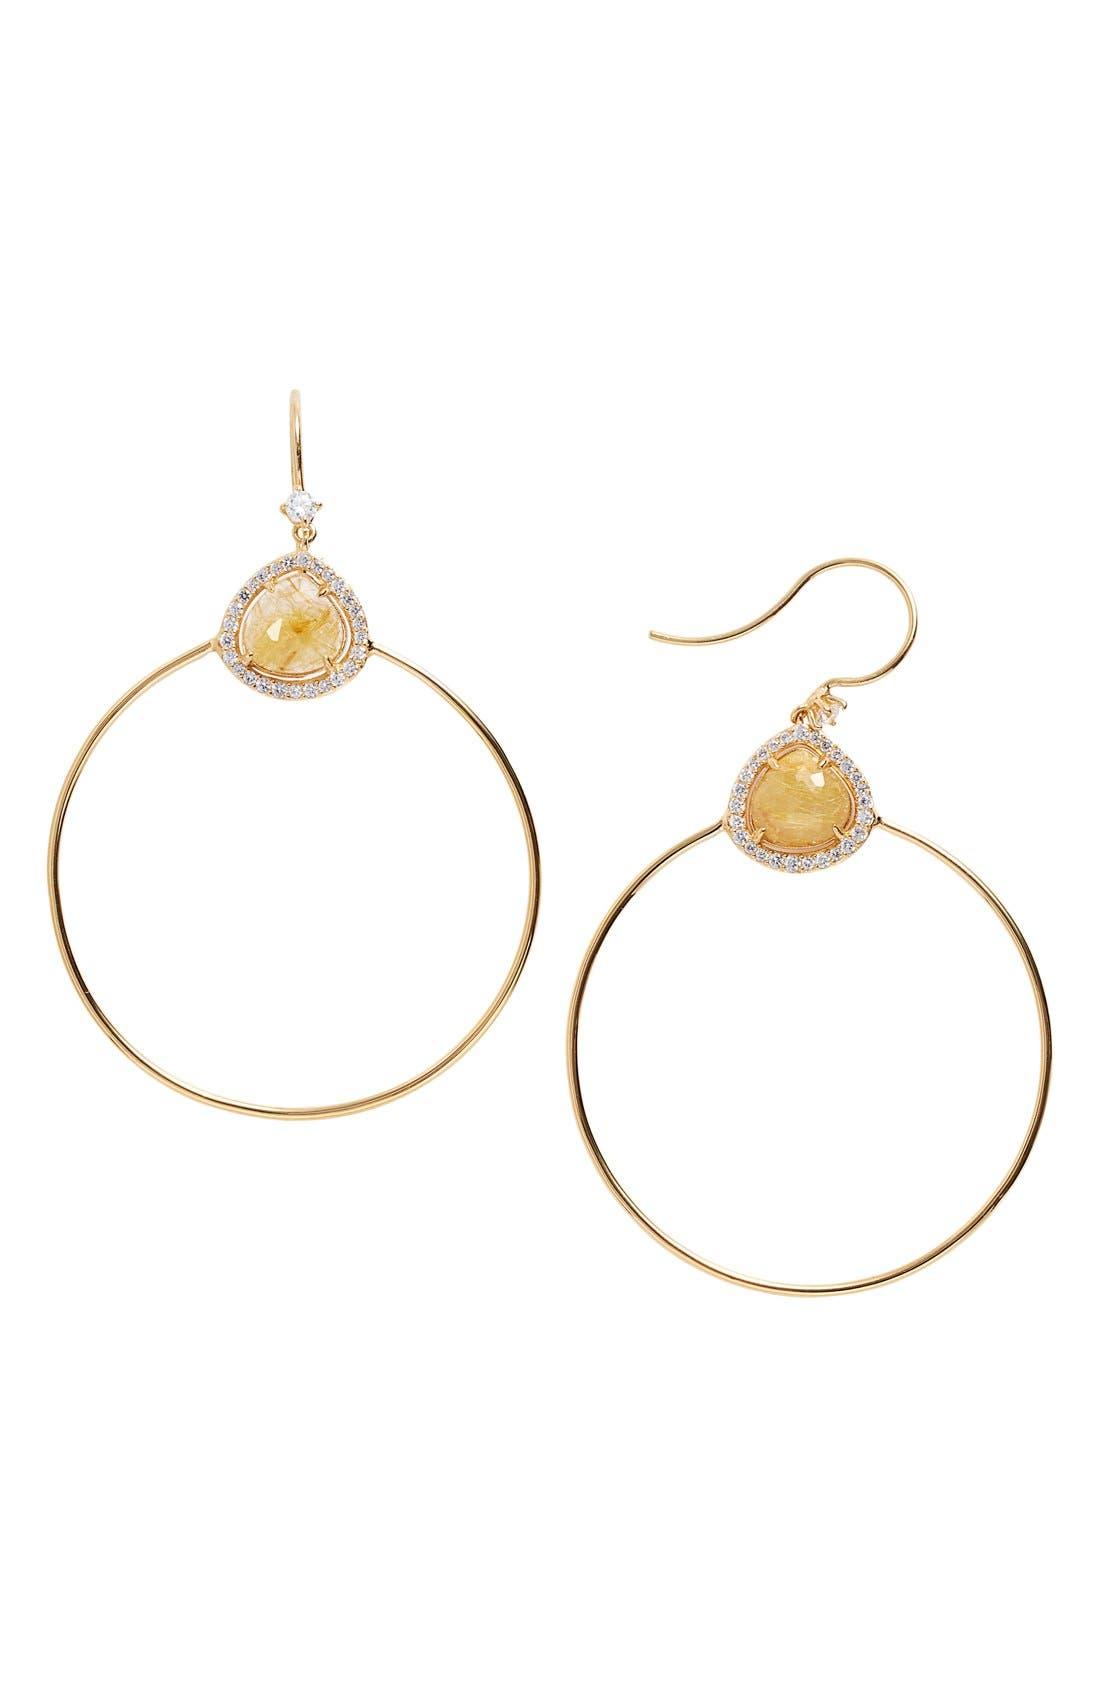 Main Image - Nadri 'Boho' Semiprecious Stone Frontal Hoop Earrings